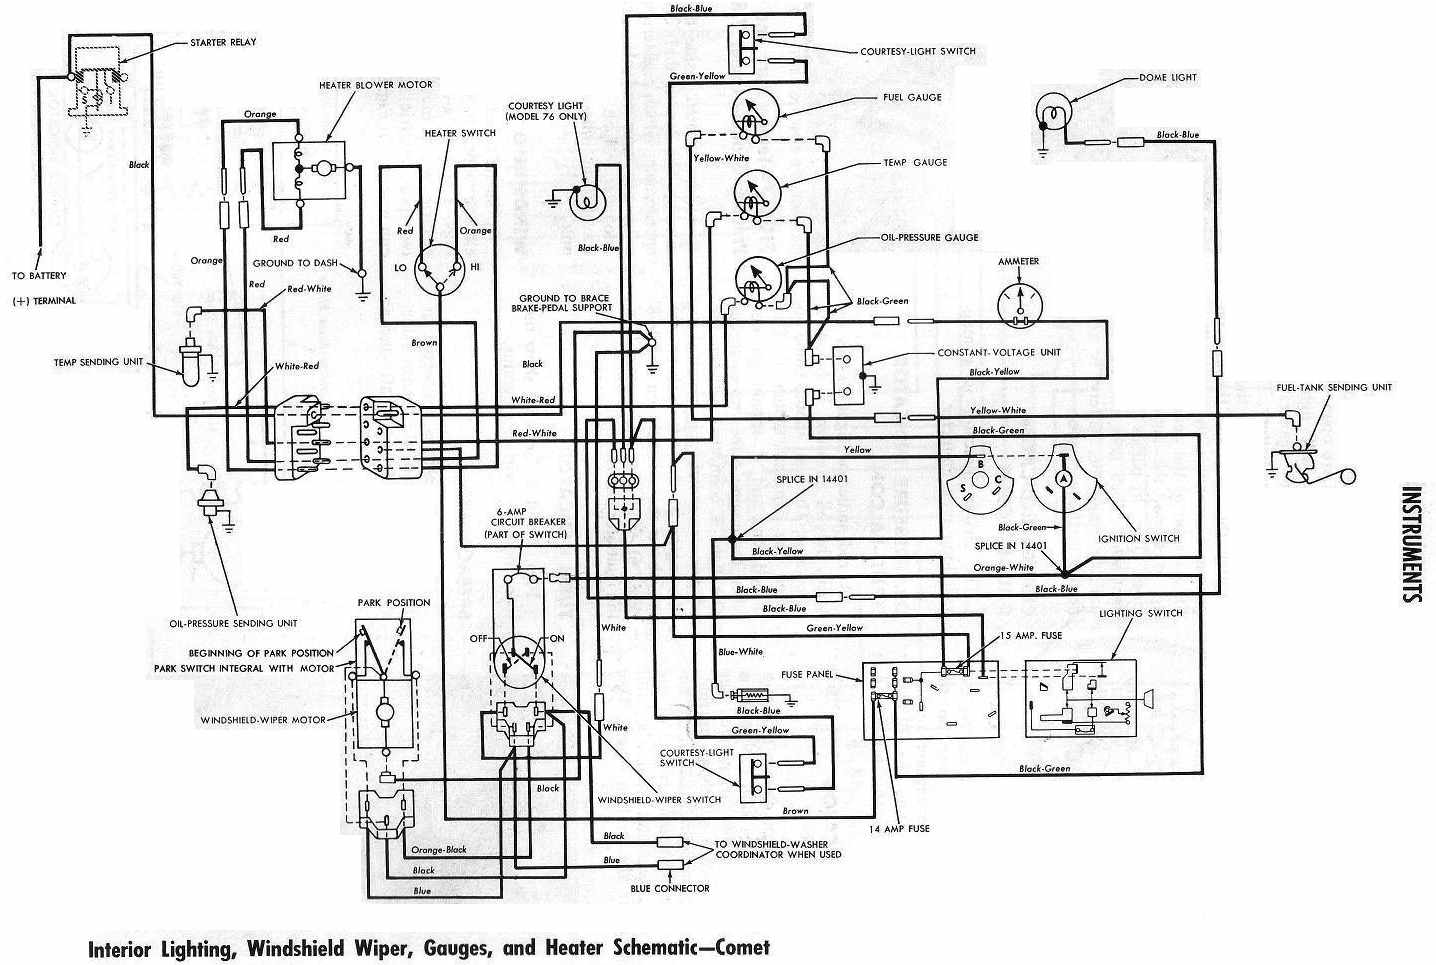 1954 Gmc Wiring Diagram Schematics Dodge Free Picture Schematic Mercury Trusted Diagrams Gm Factory